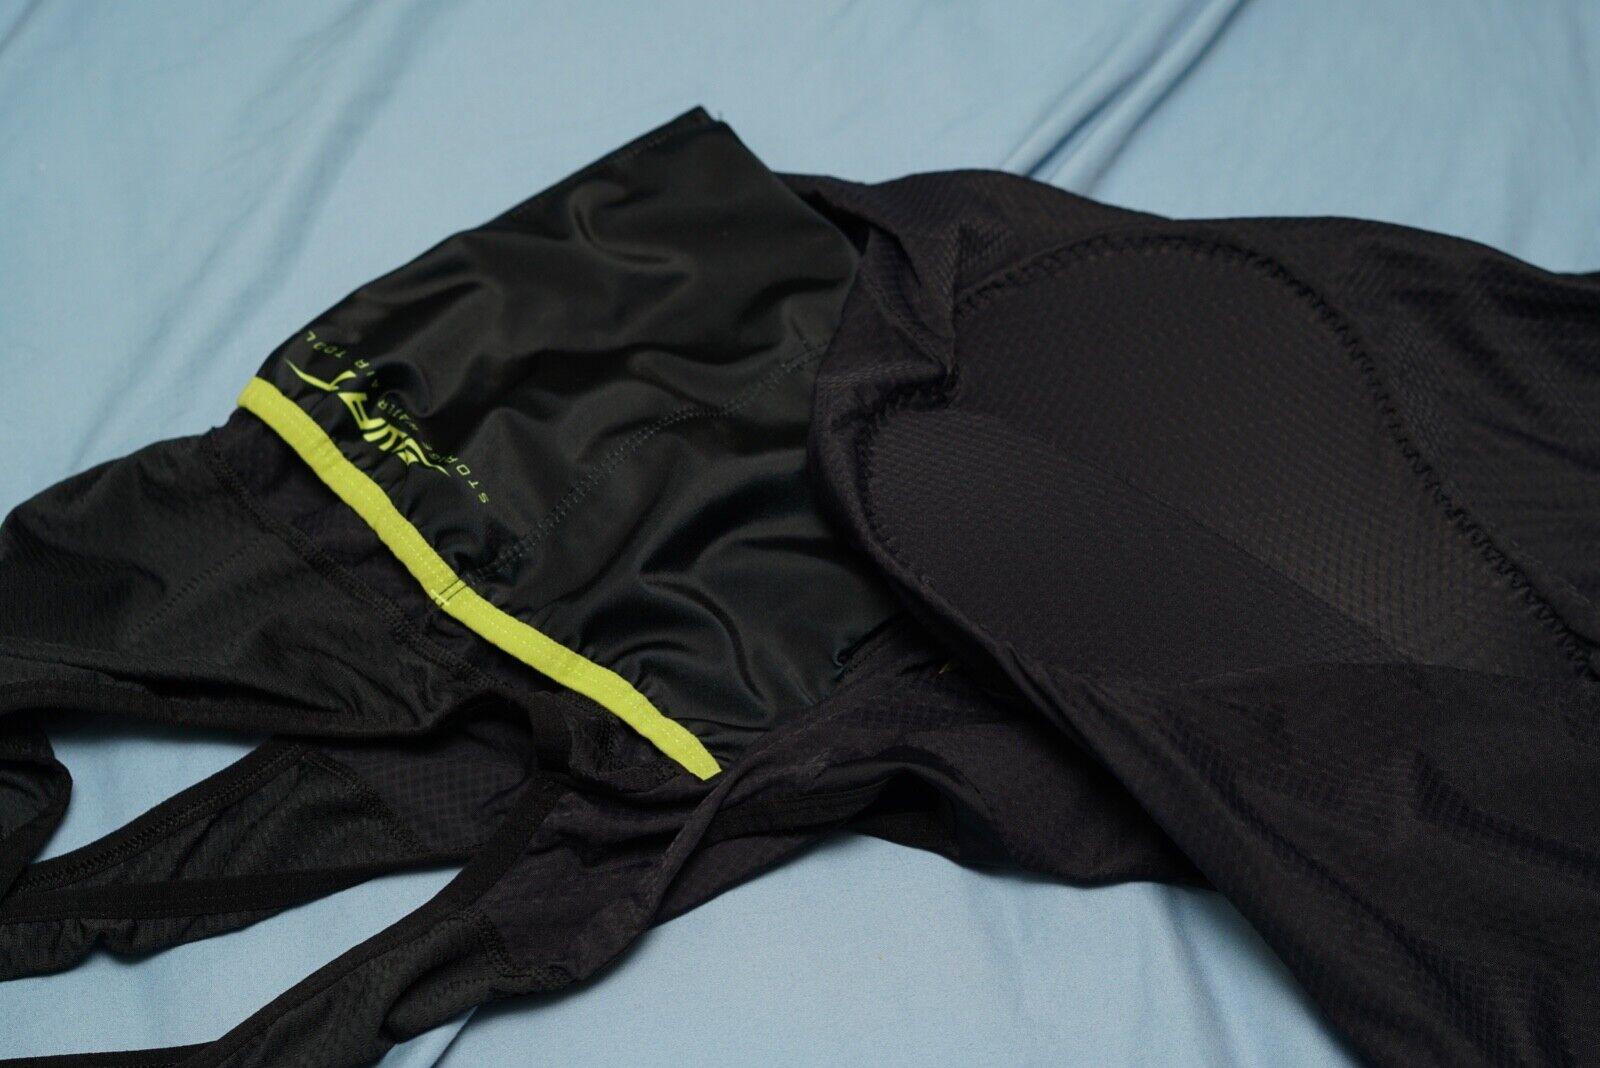 Specialized MTB Swat Bib Shorts For Mountain Bikes Medium Mens - $45.00